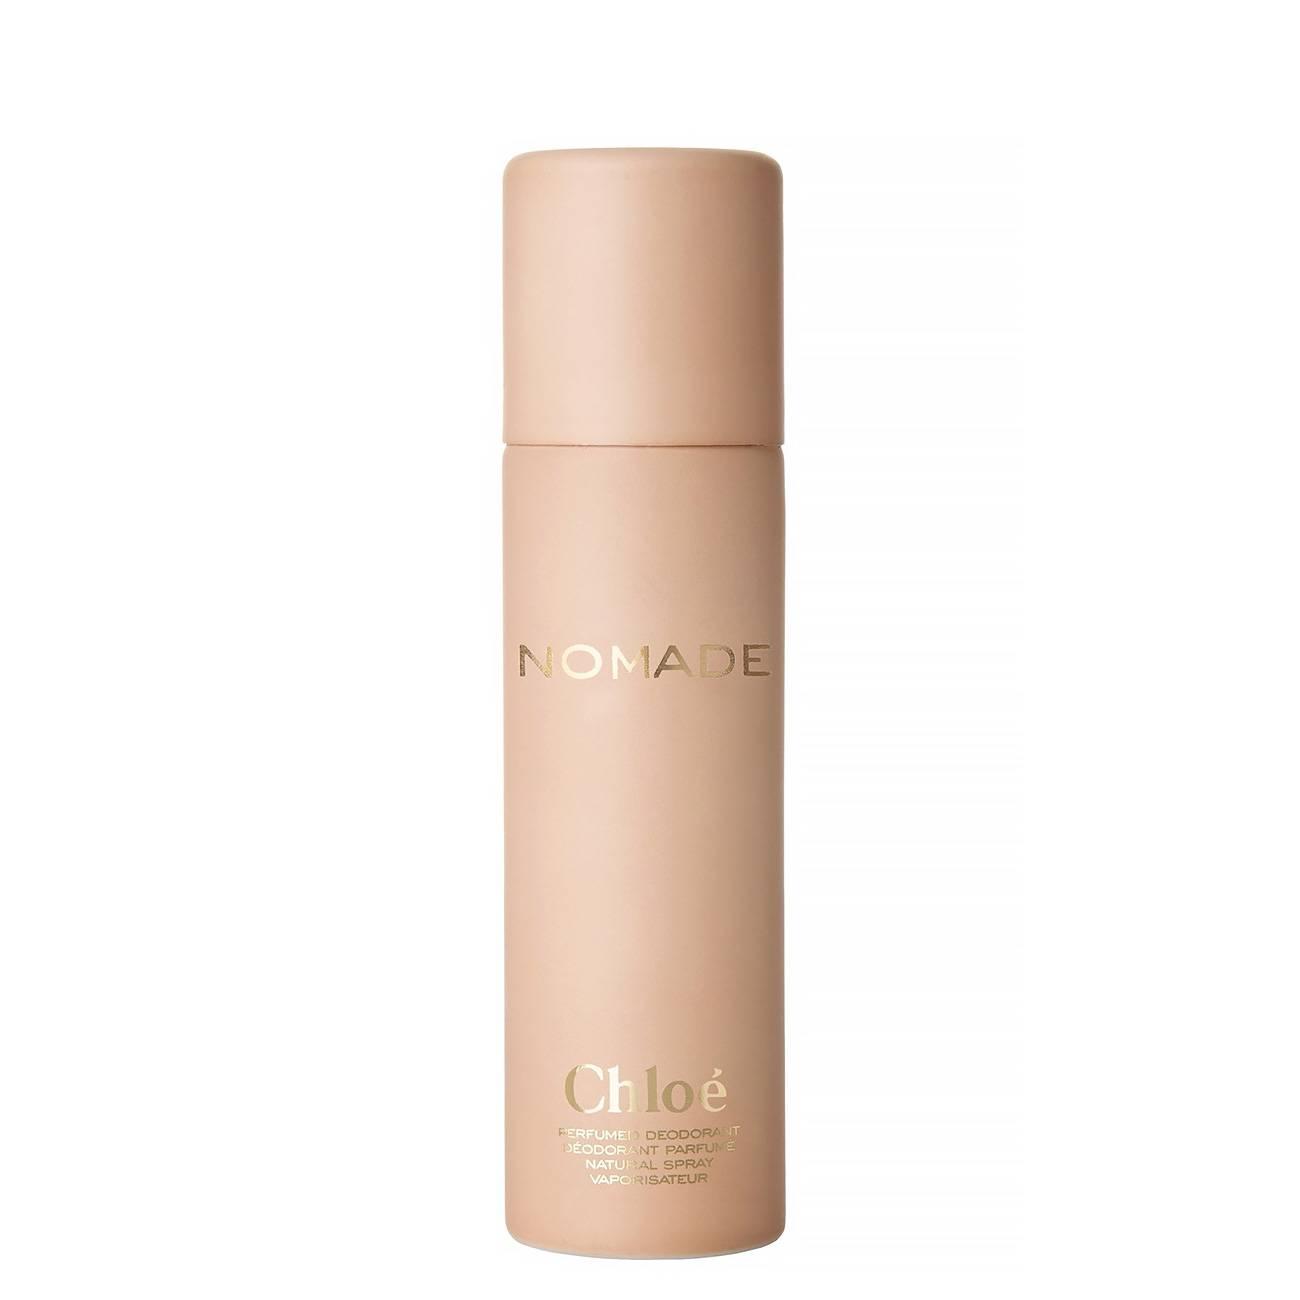 Nomade Perfumed Deodorant 100ml Chloe imagine 2021 bestvalue.eu